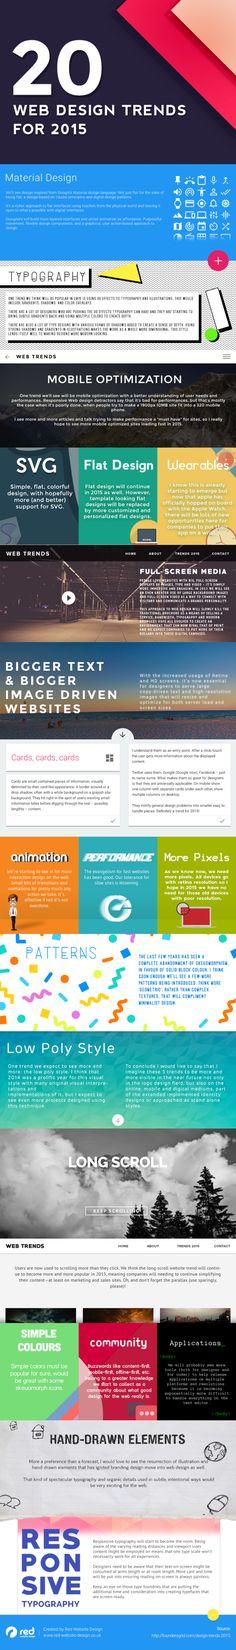 20 Web Design Trends